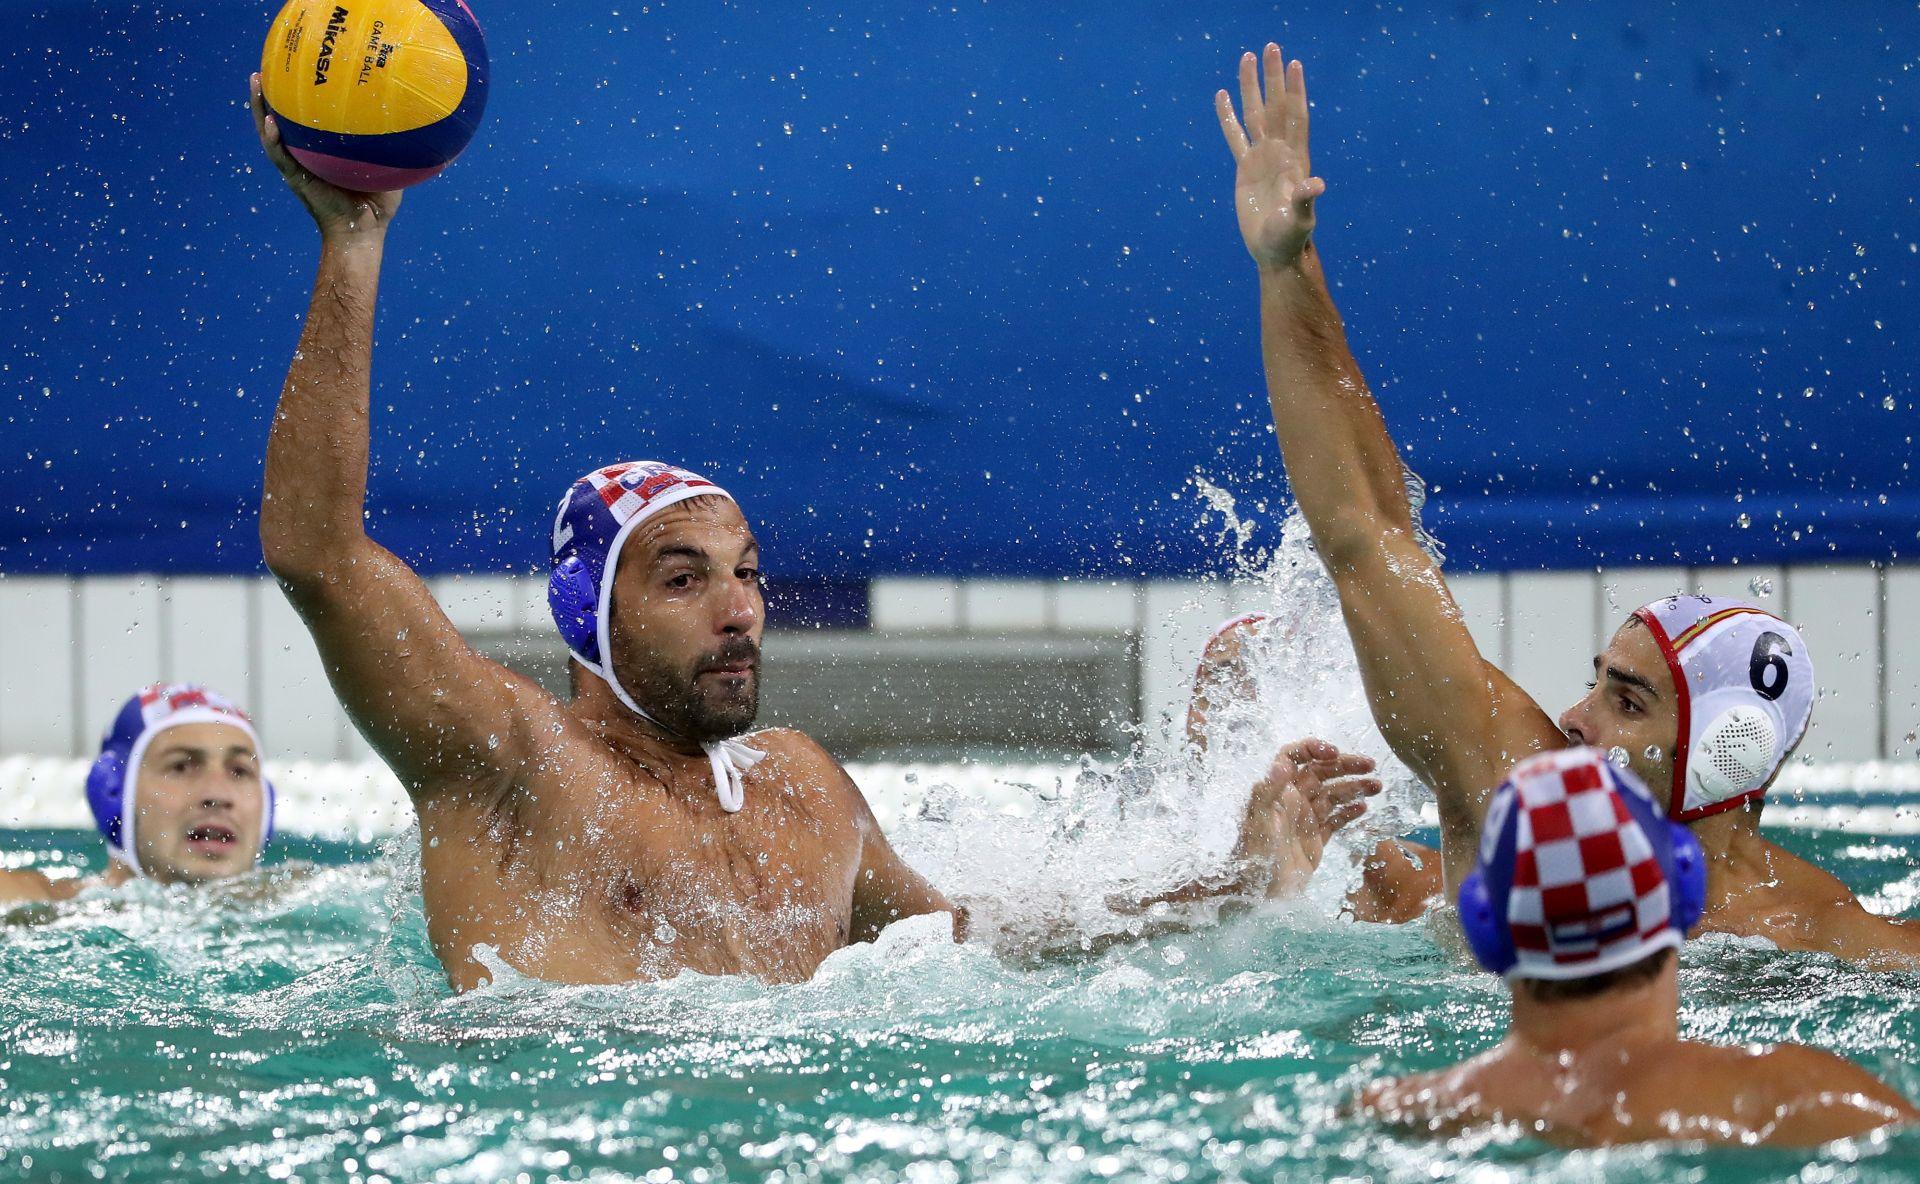 OI RIO: Hrvatska – Italija 10-7